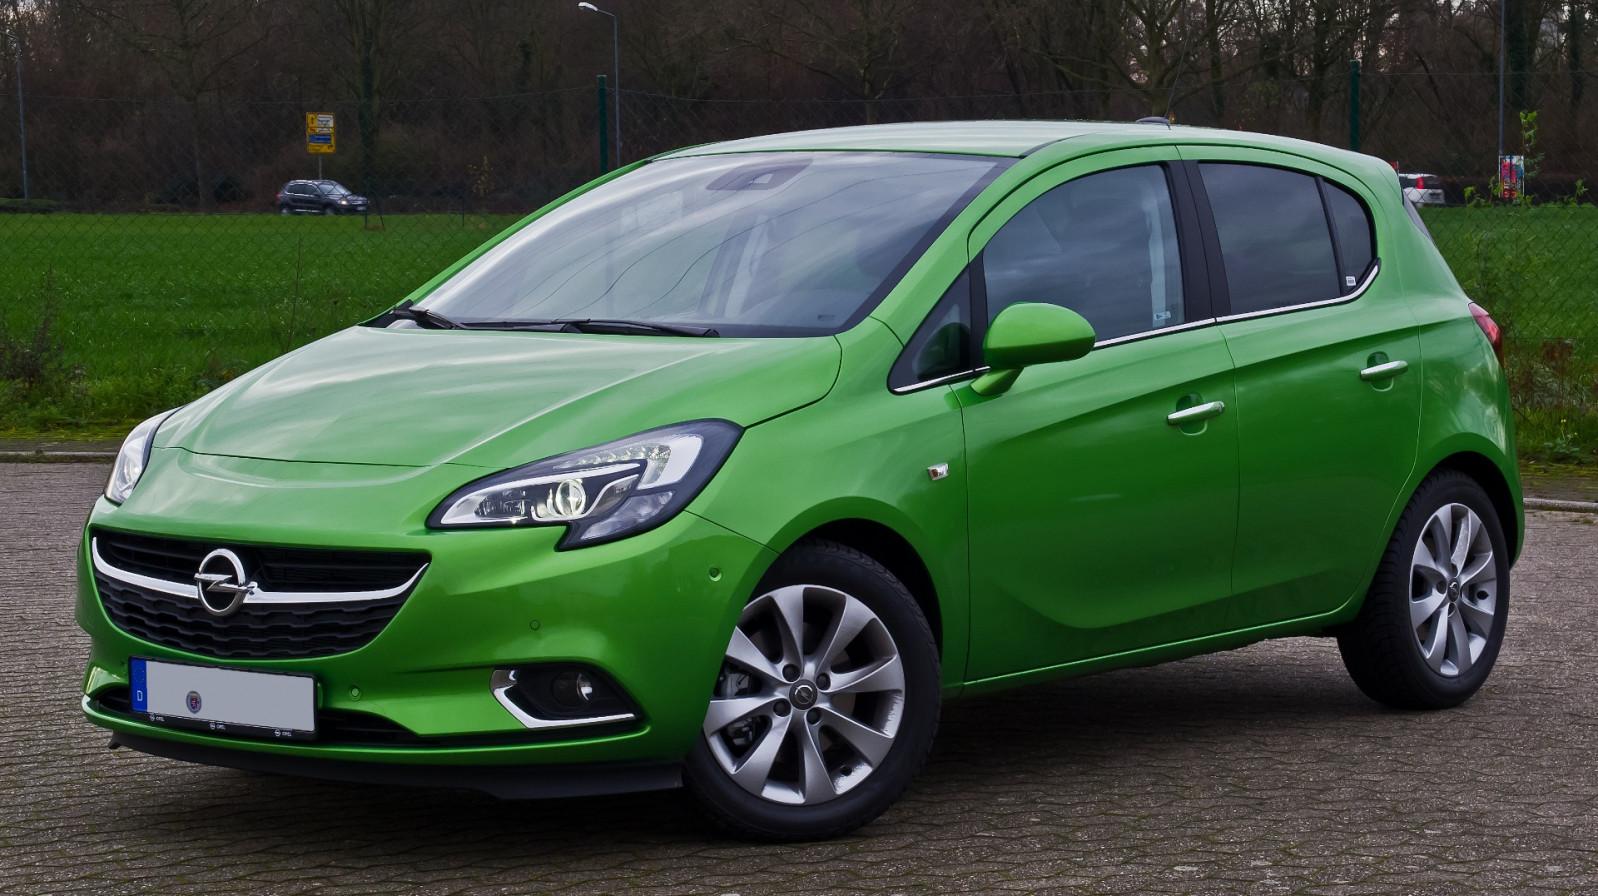 Opel Corsa 5